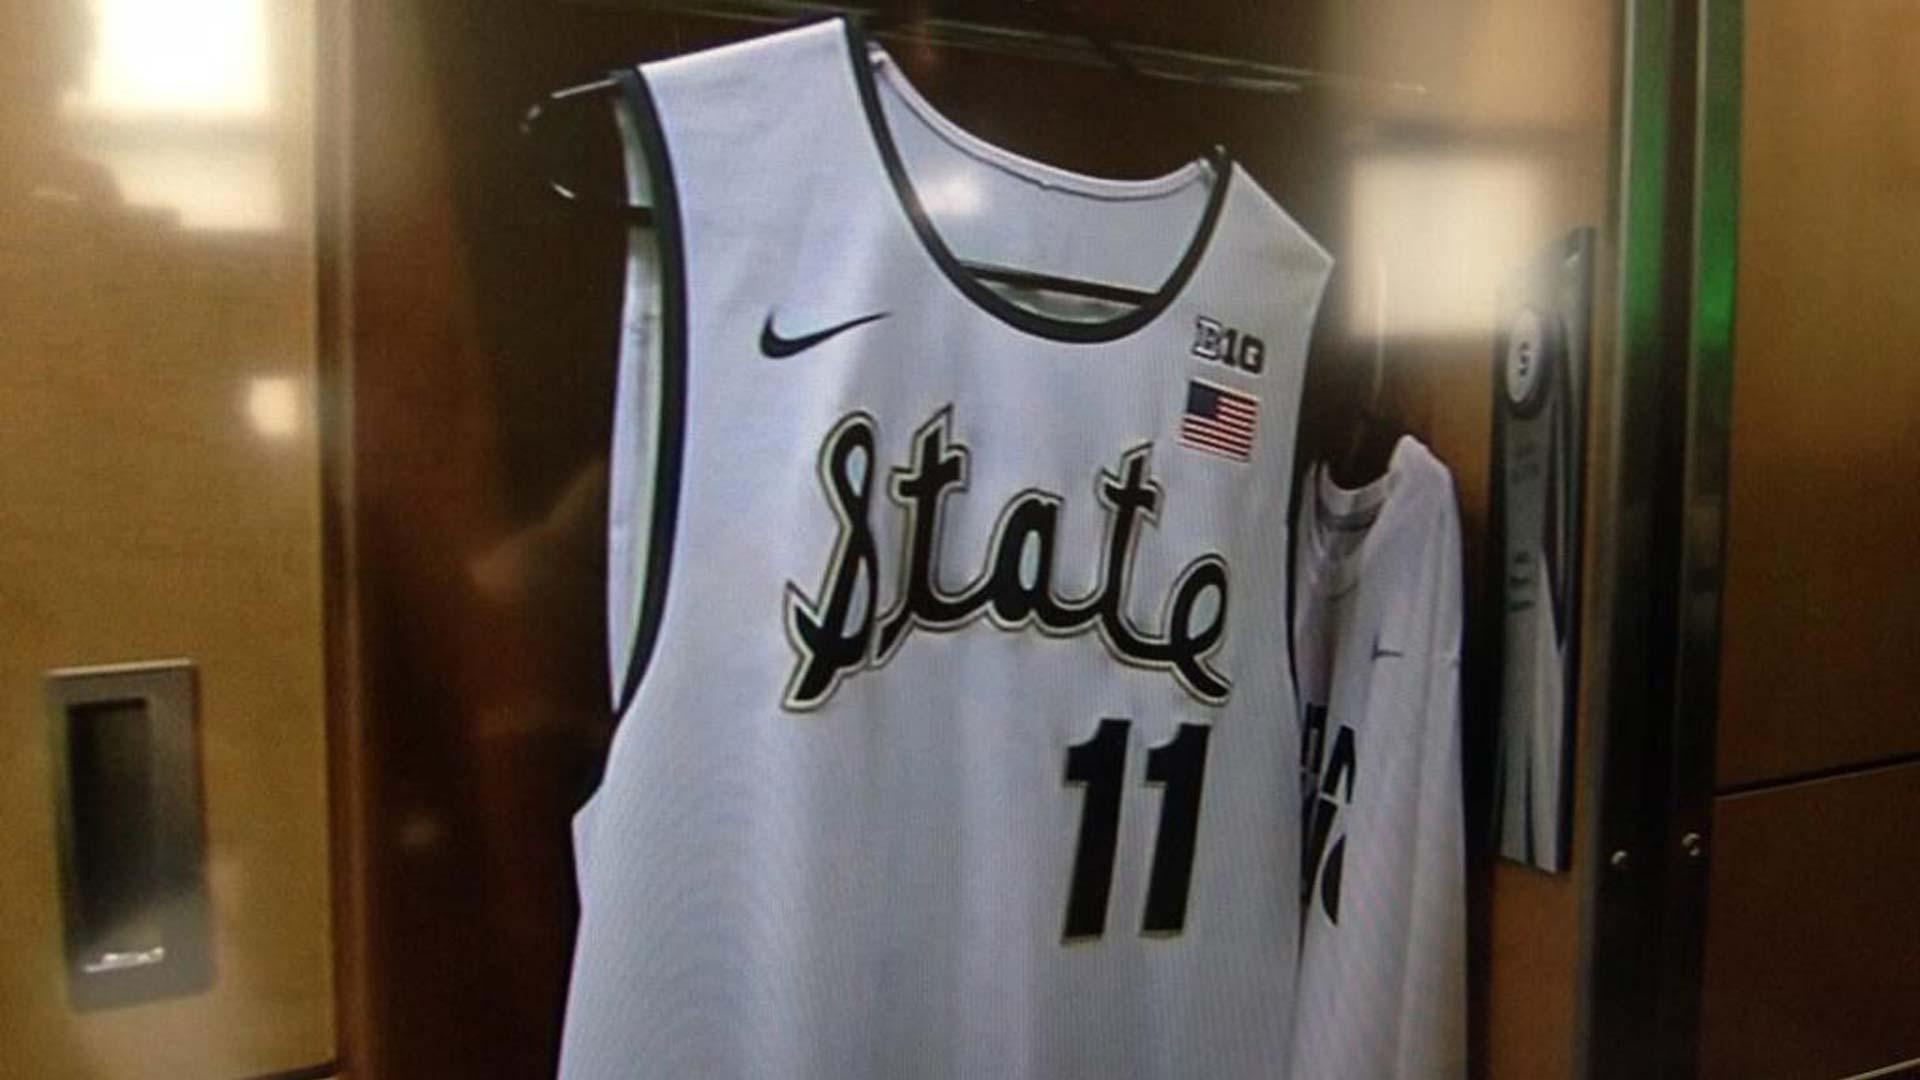 michigan-state-throwback-uniforms-12514-twitter-ftr